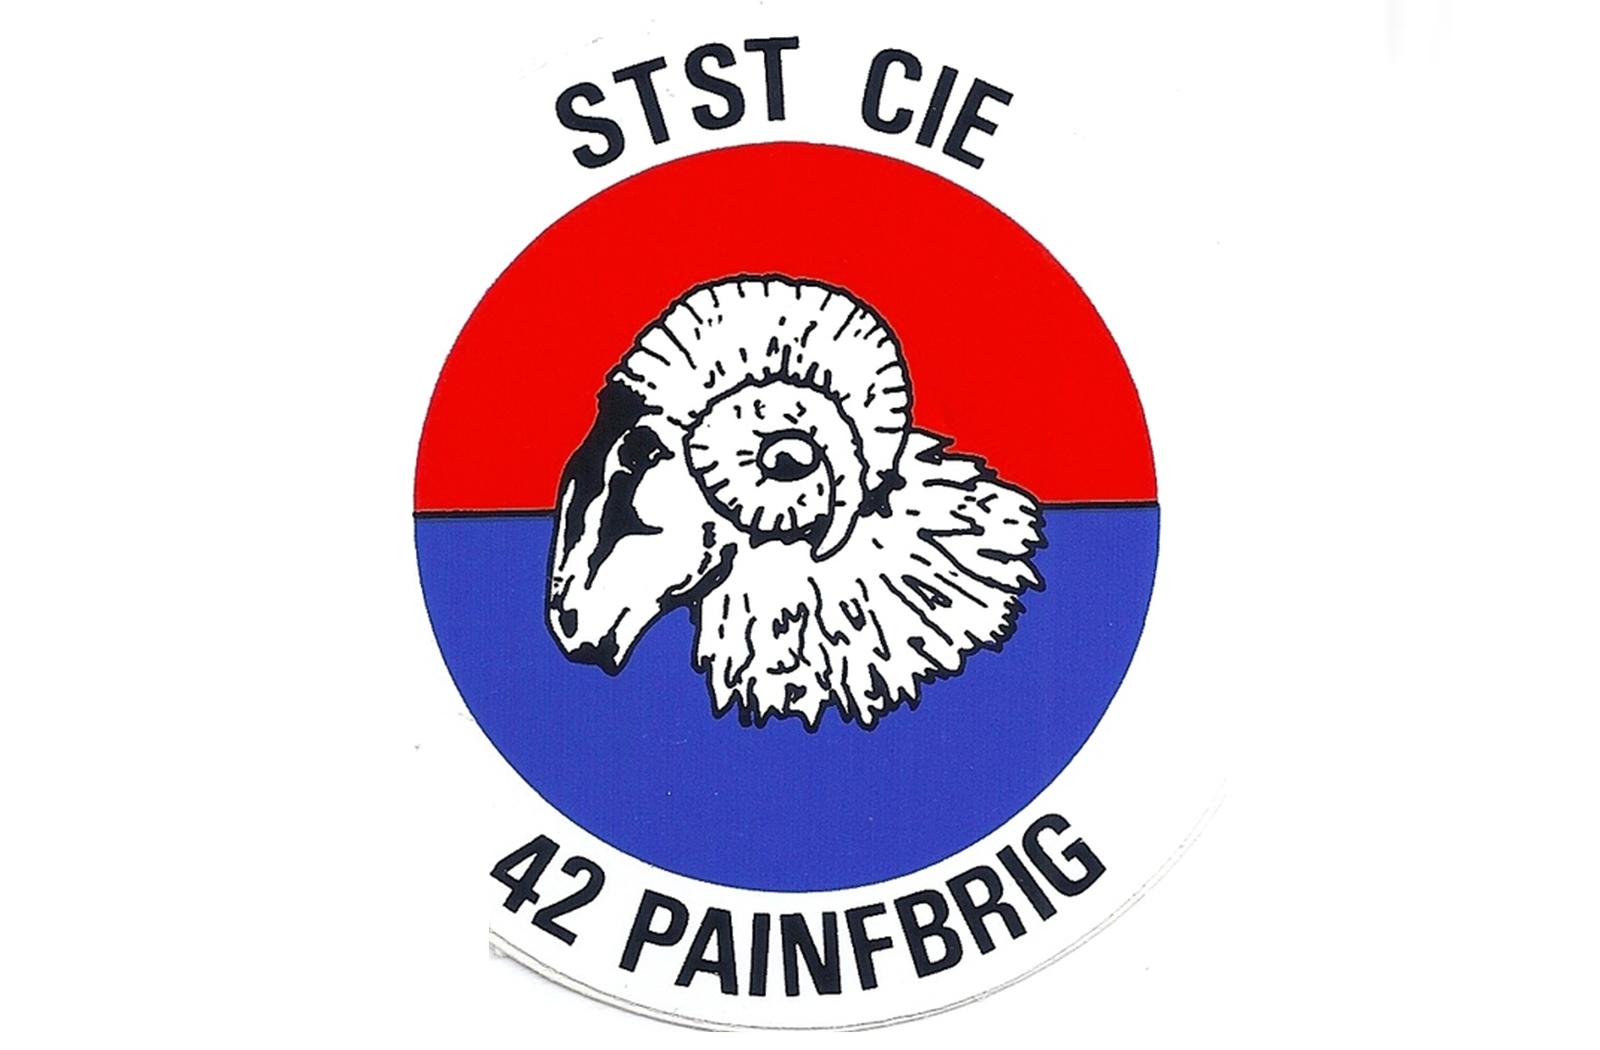 STST-CIE 42 PAINFBRIG